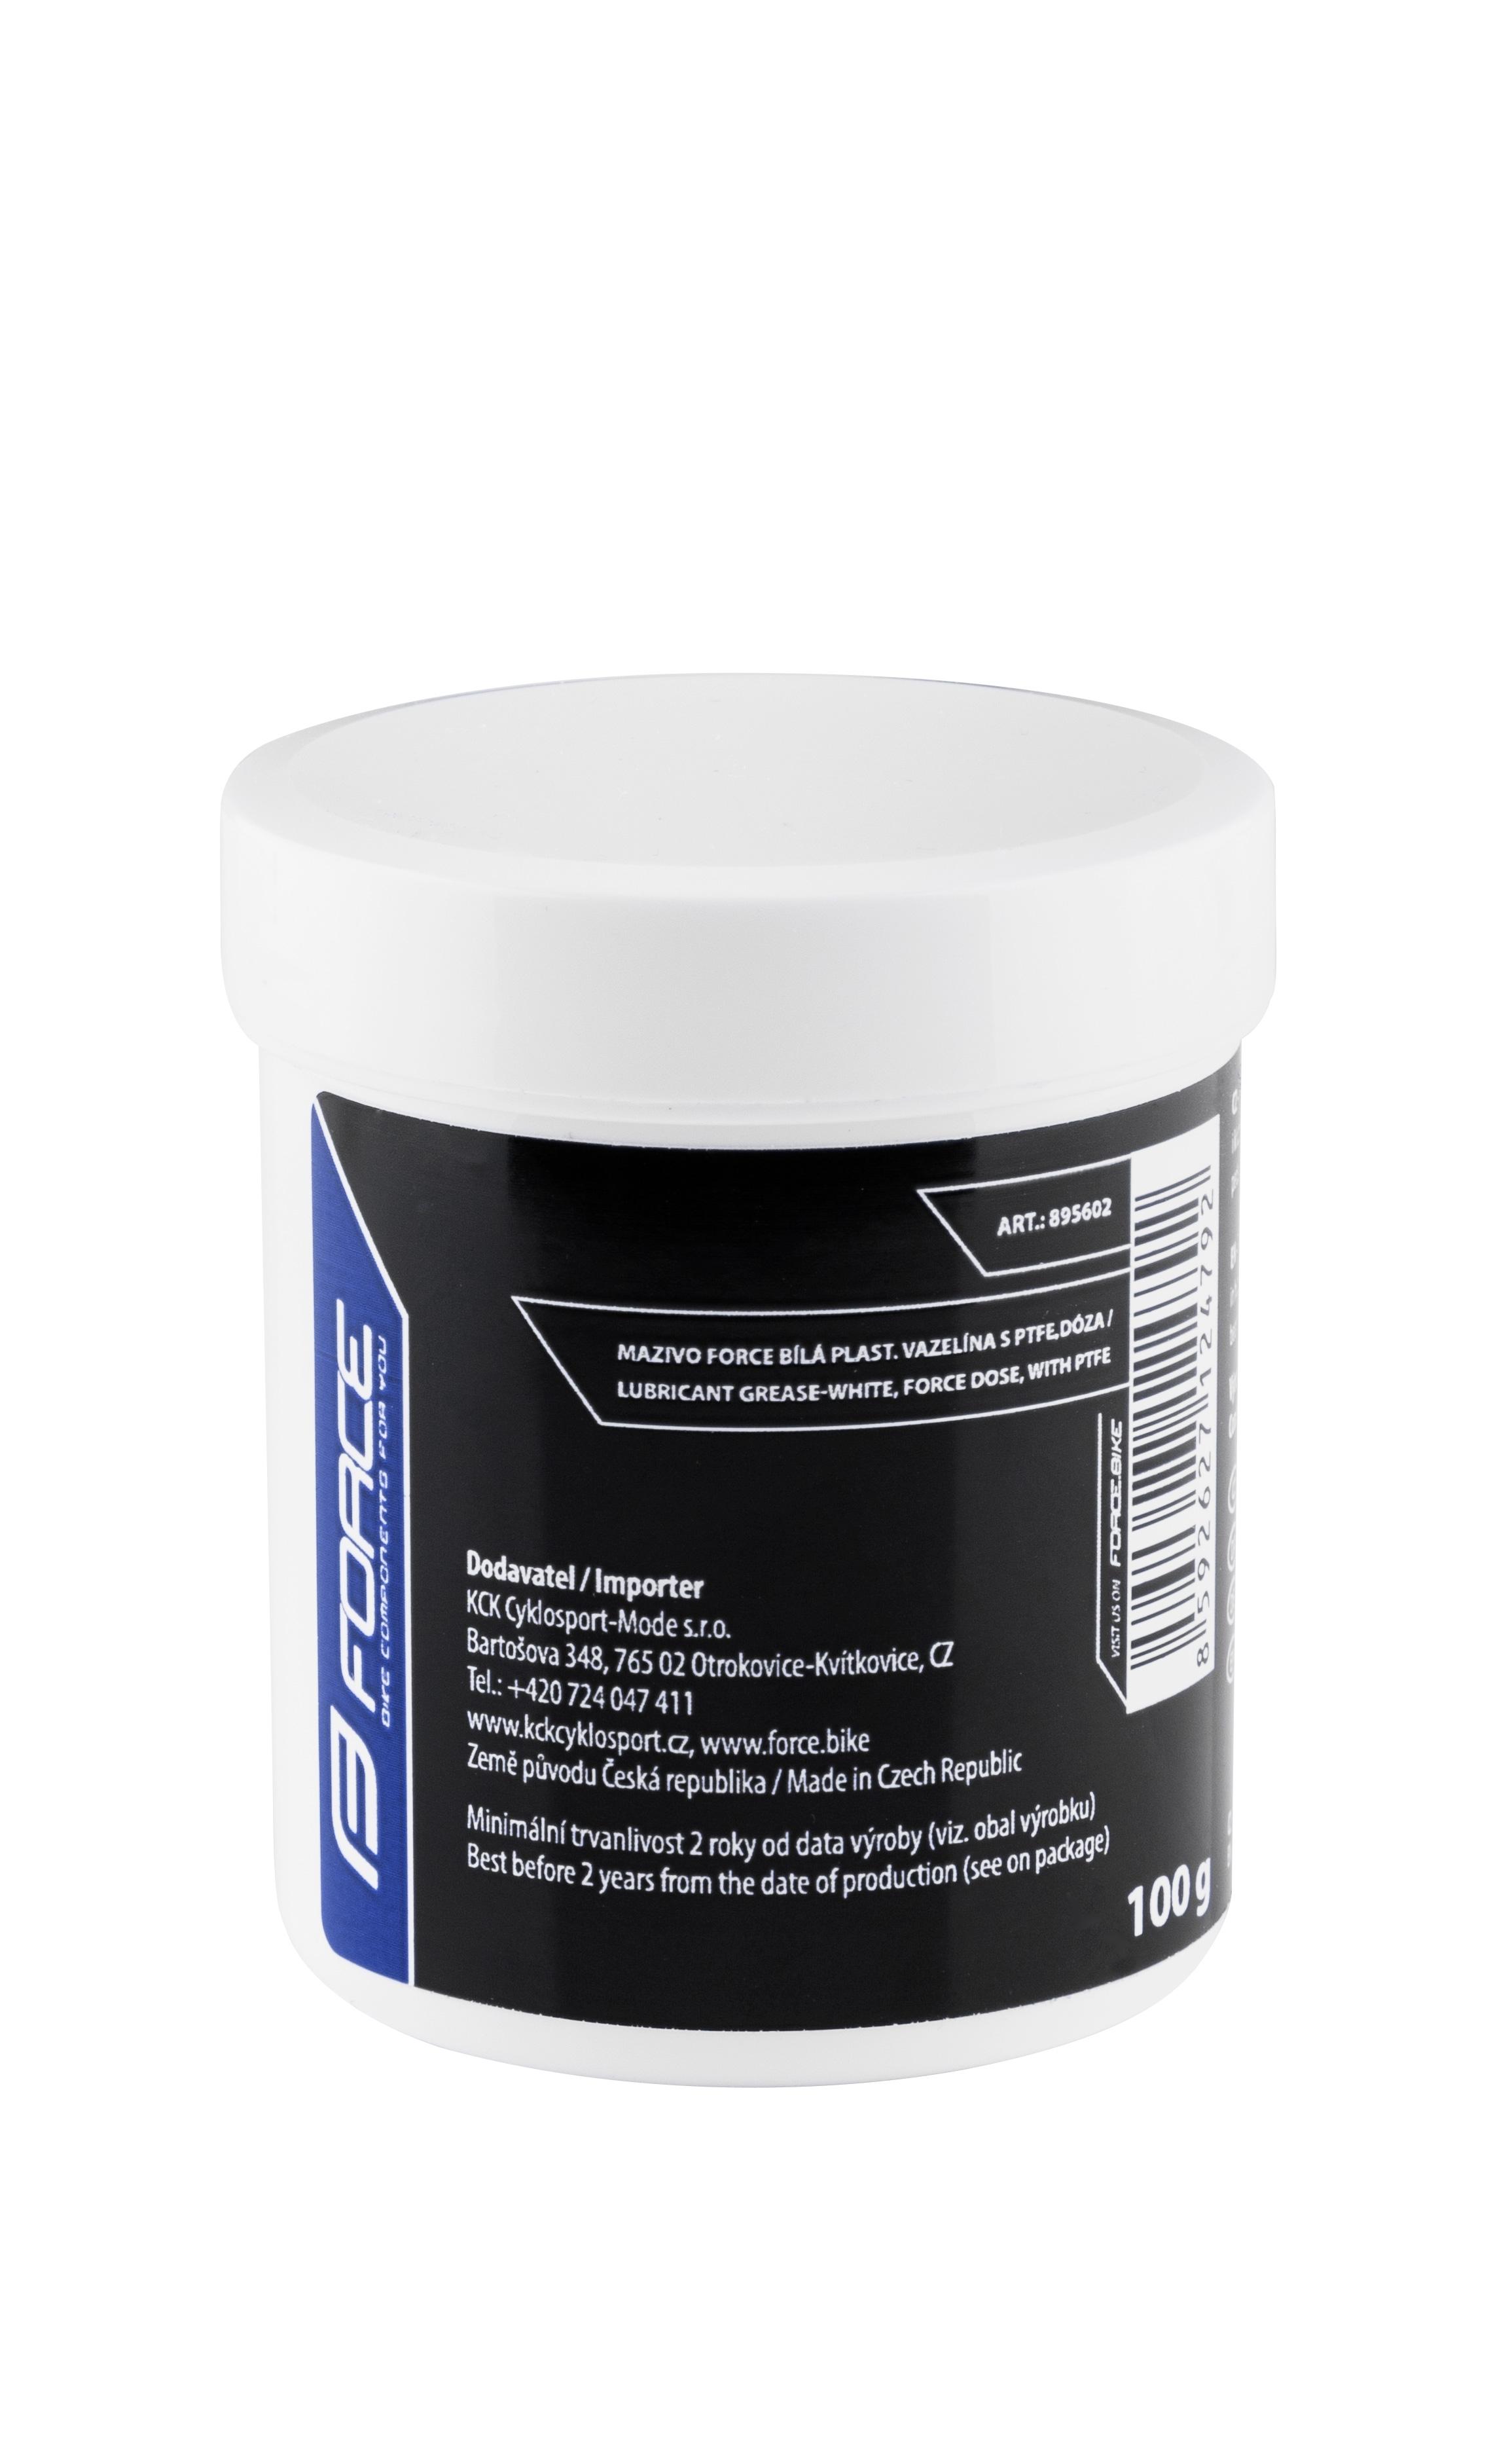 mazivo-dóza FORCE bílá plast. vazelína s PTFE,100g